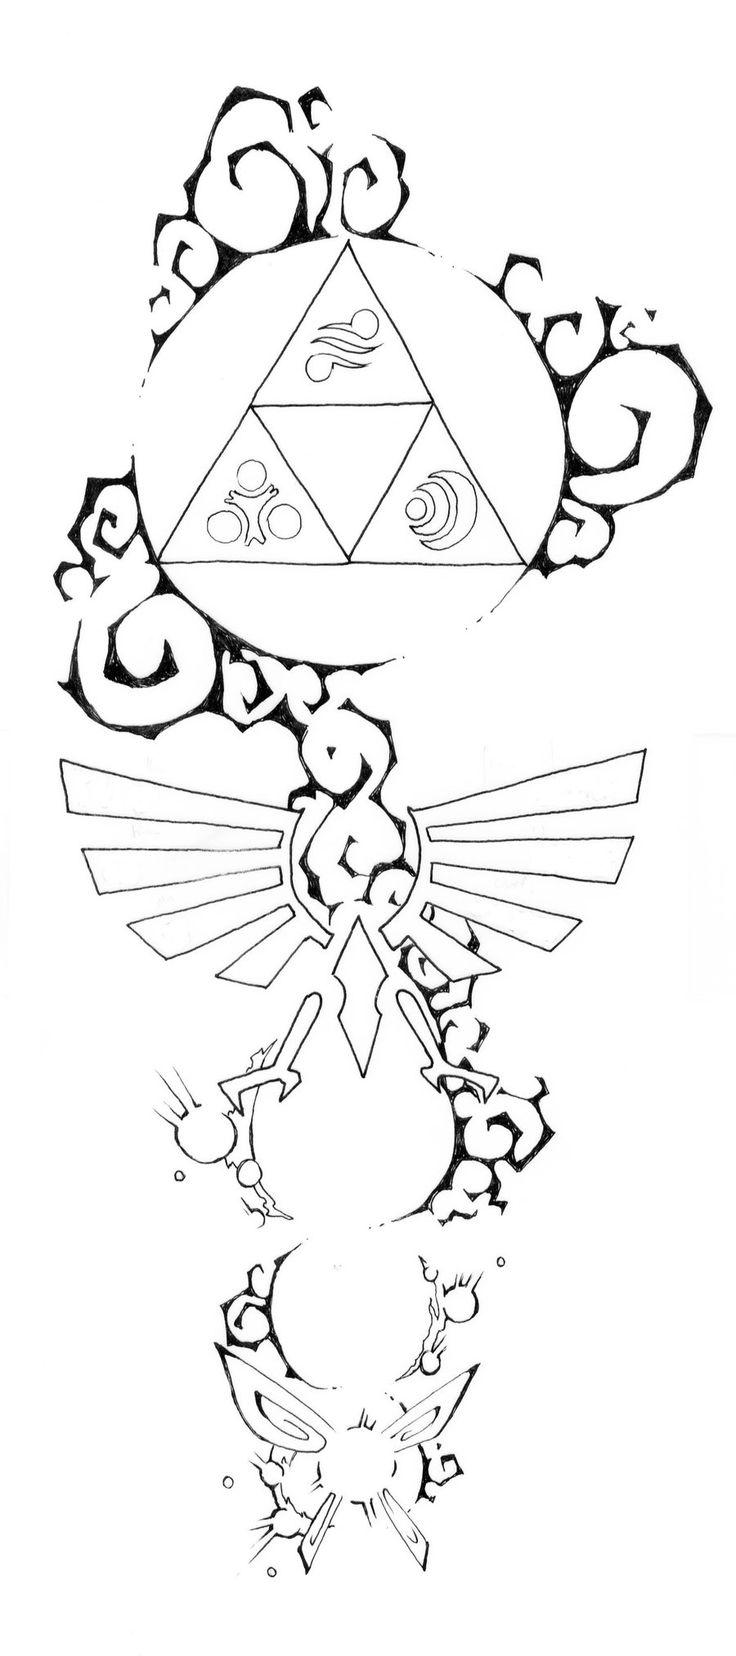 best tattoos images on pinterest tattoo ideas butterflies and